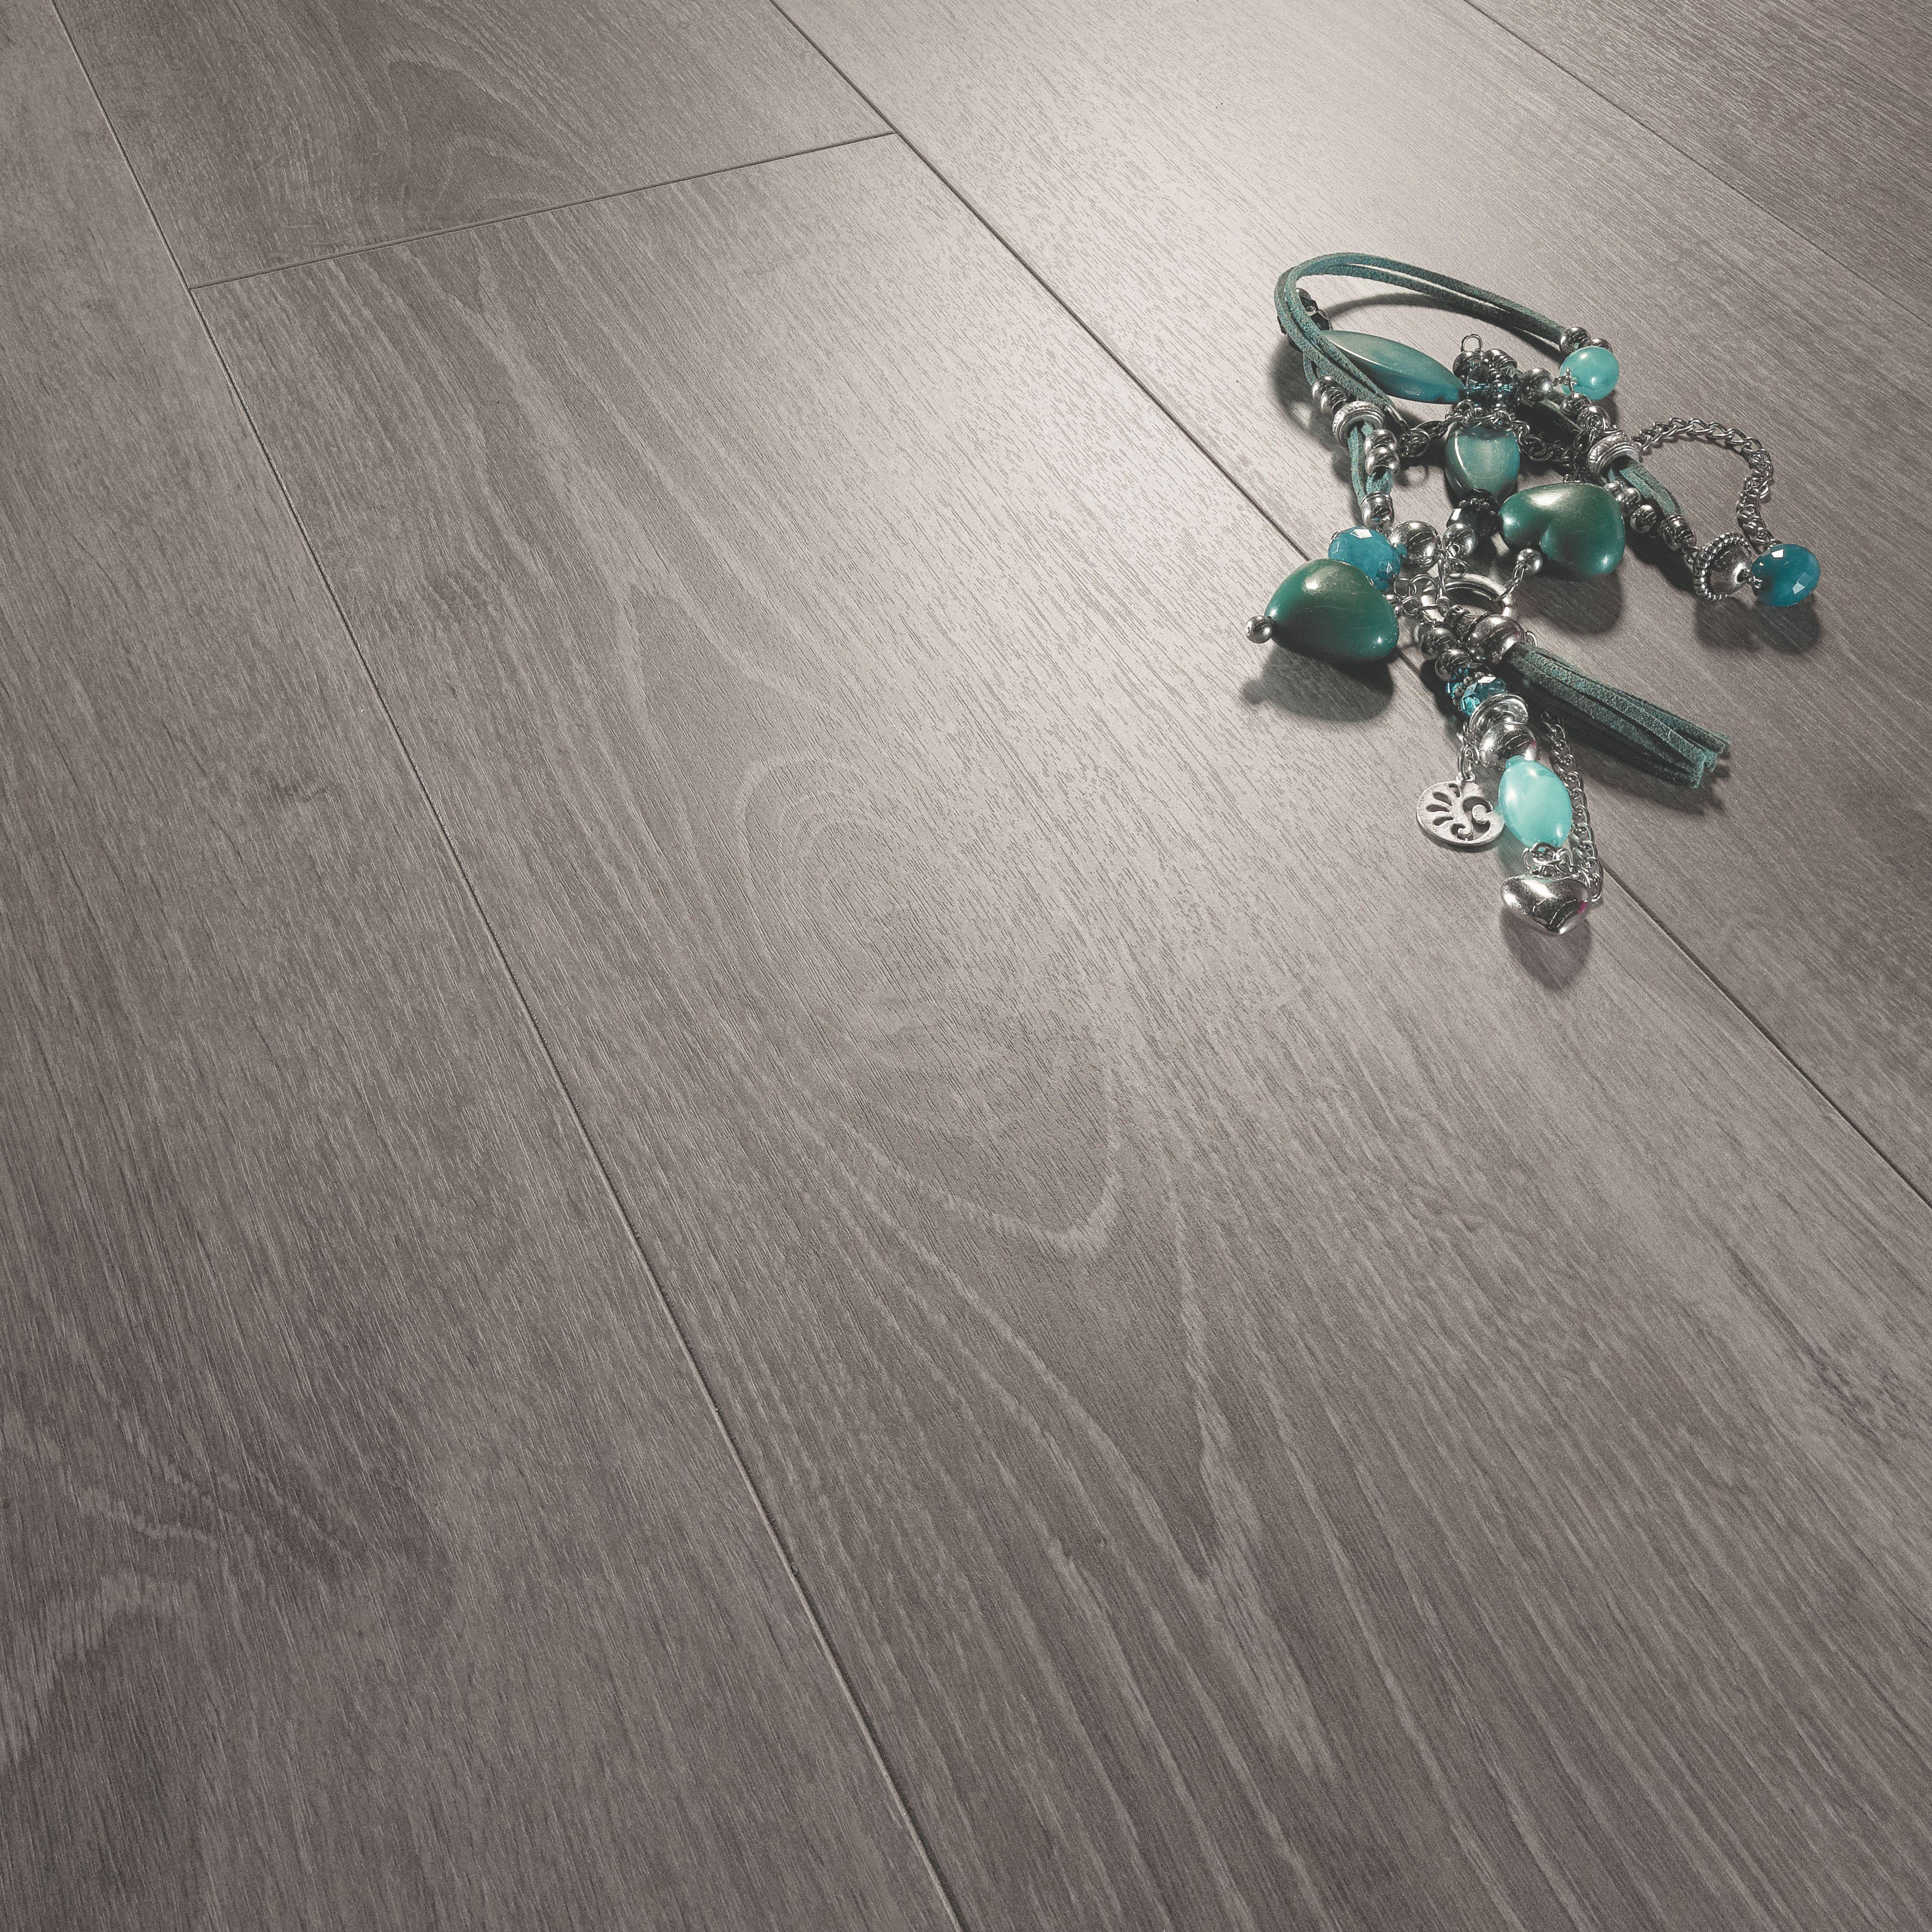 Gray Laminate Flooring light grey laminate flooring laminate flooring installation ideas Bodrum Grey Wood Effect Laminate Flooring 213 M Pack